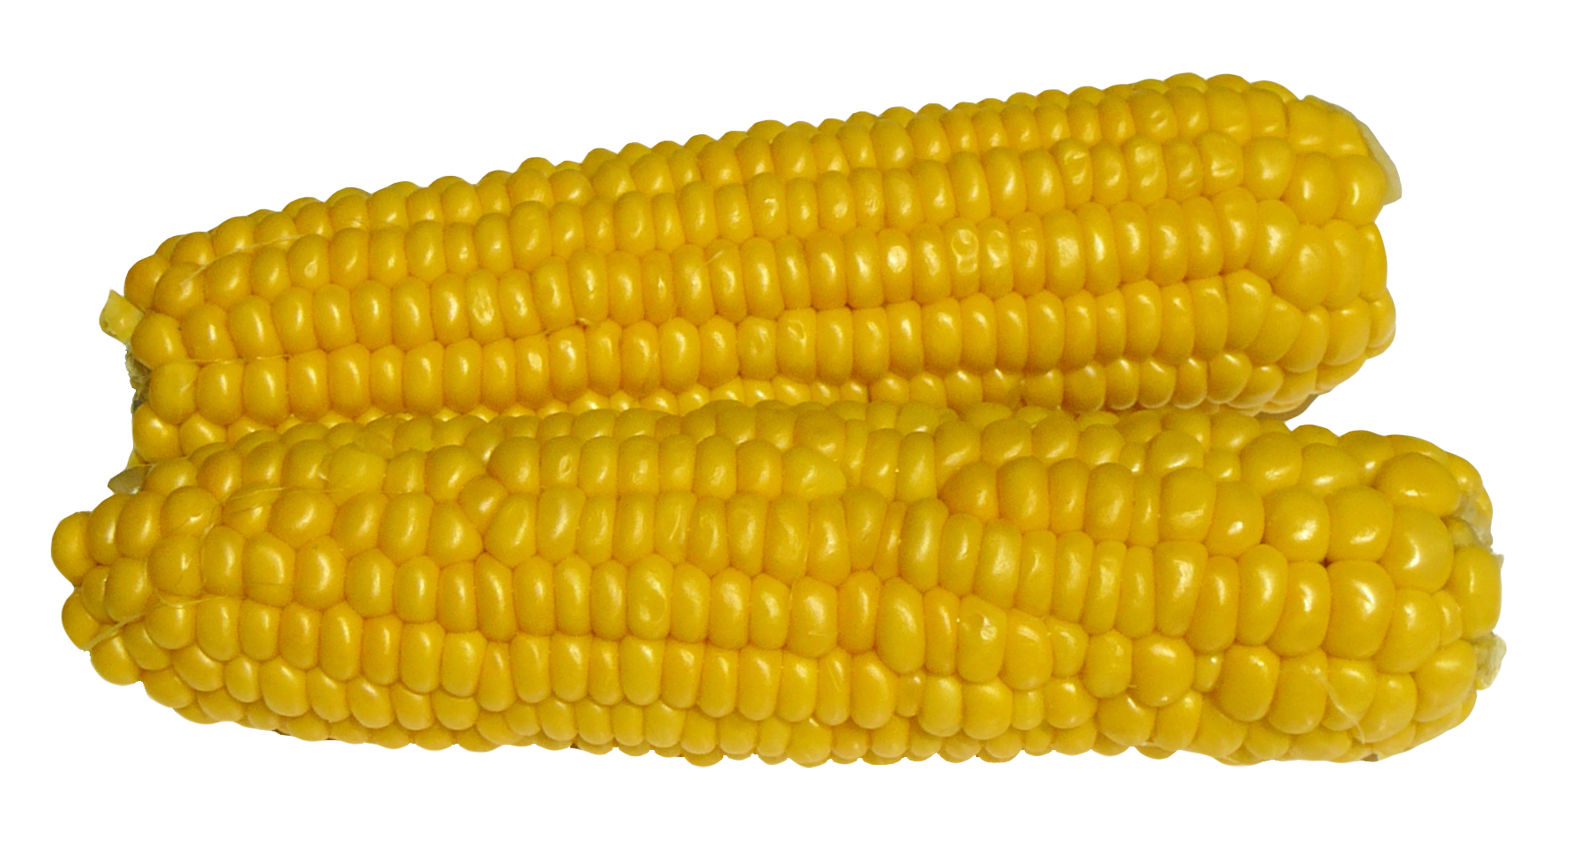 Corn PNG - 13671